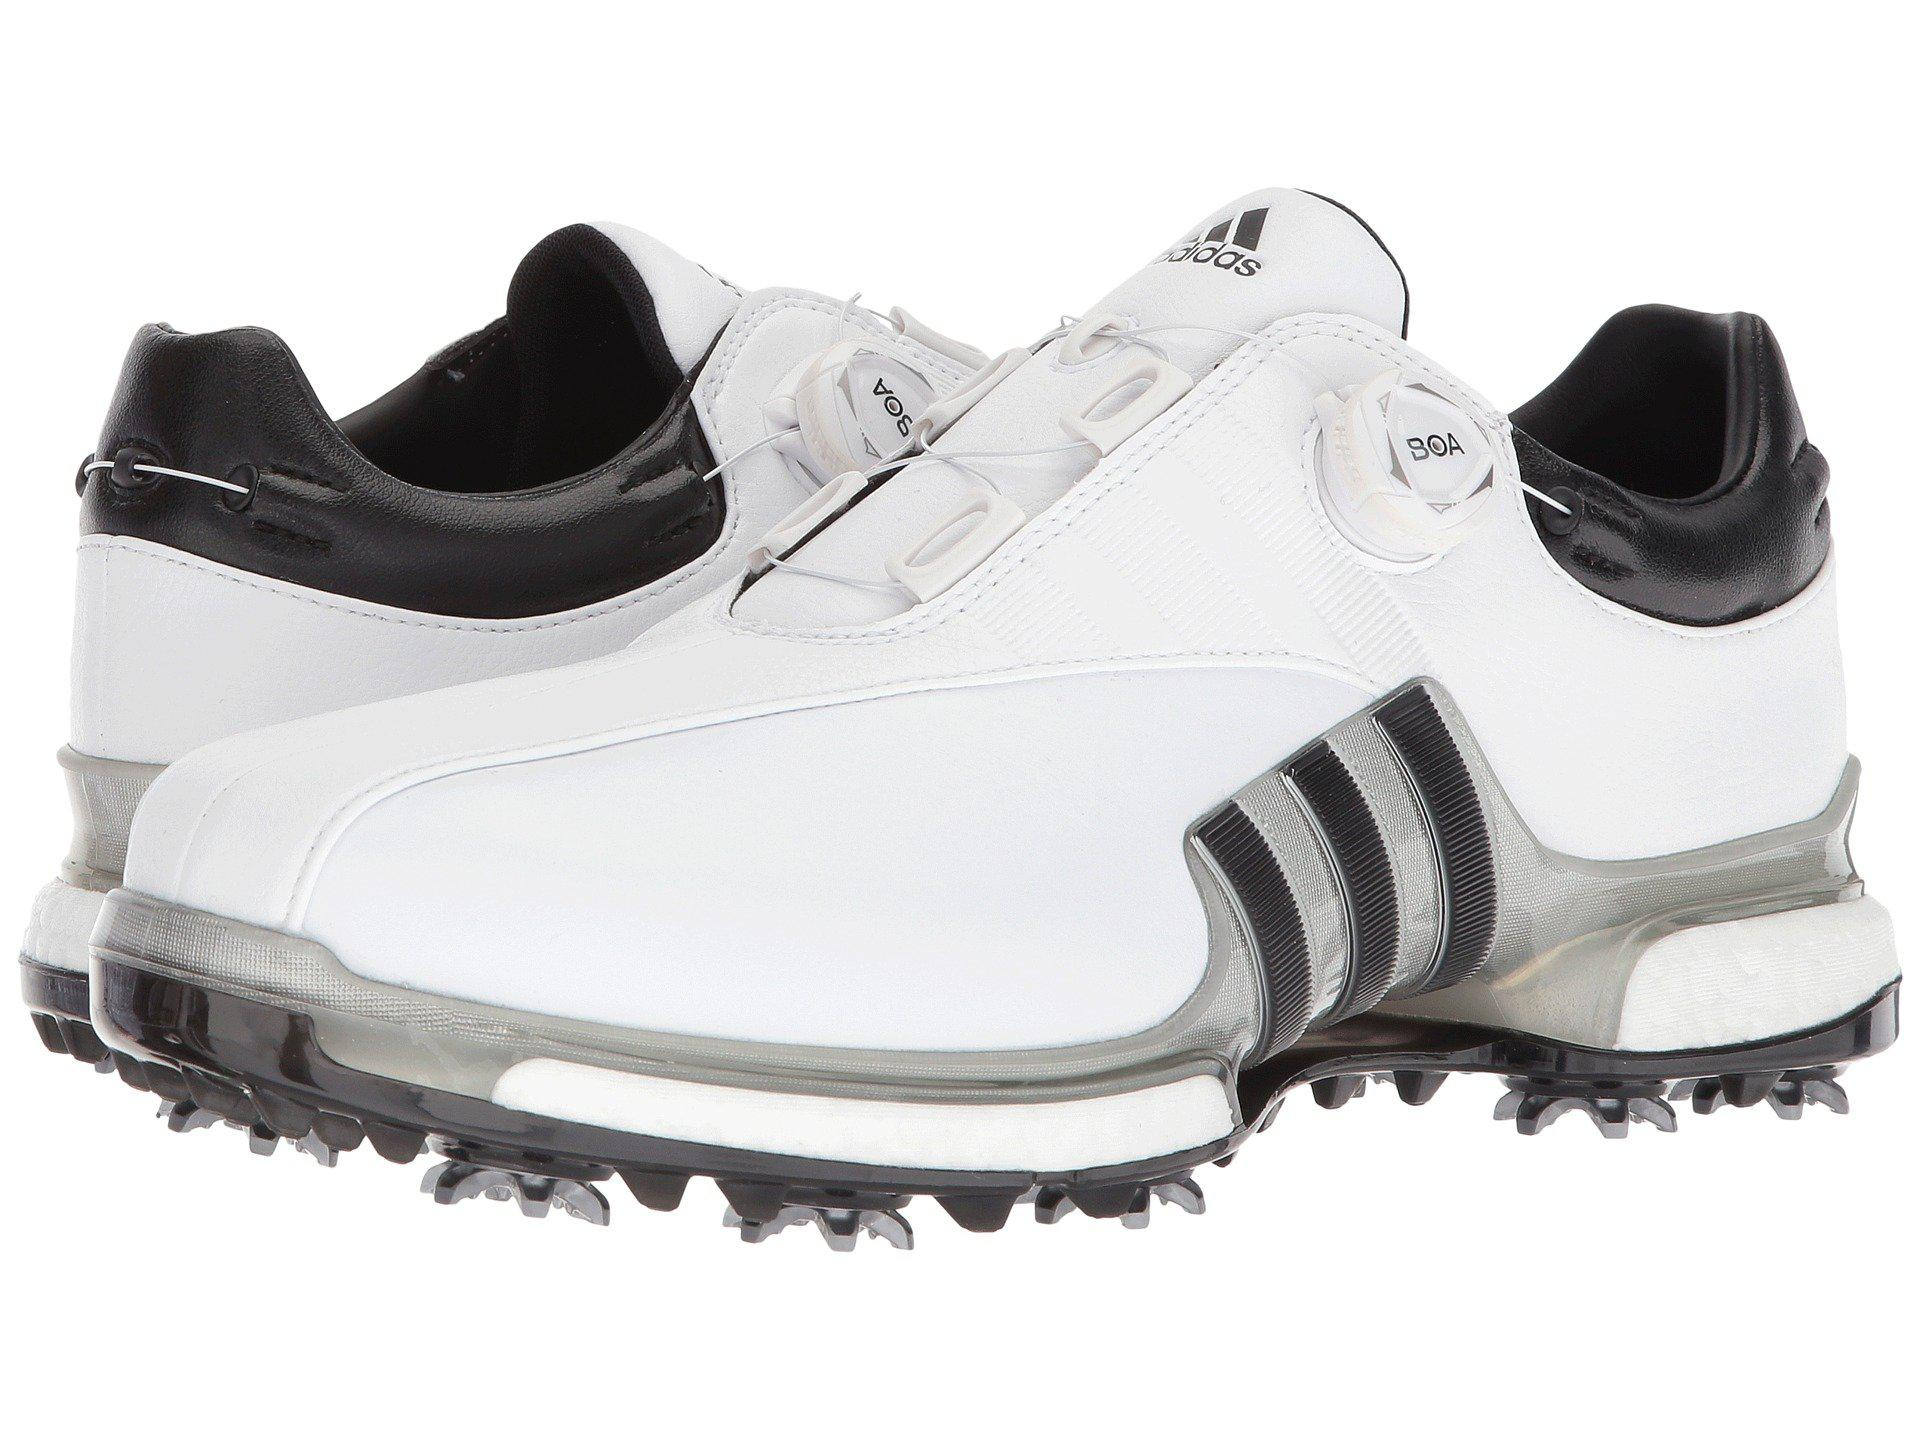 Lyst adidas originali tour360 eqt boa (calzature bianche / silver